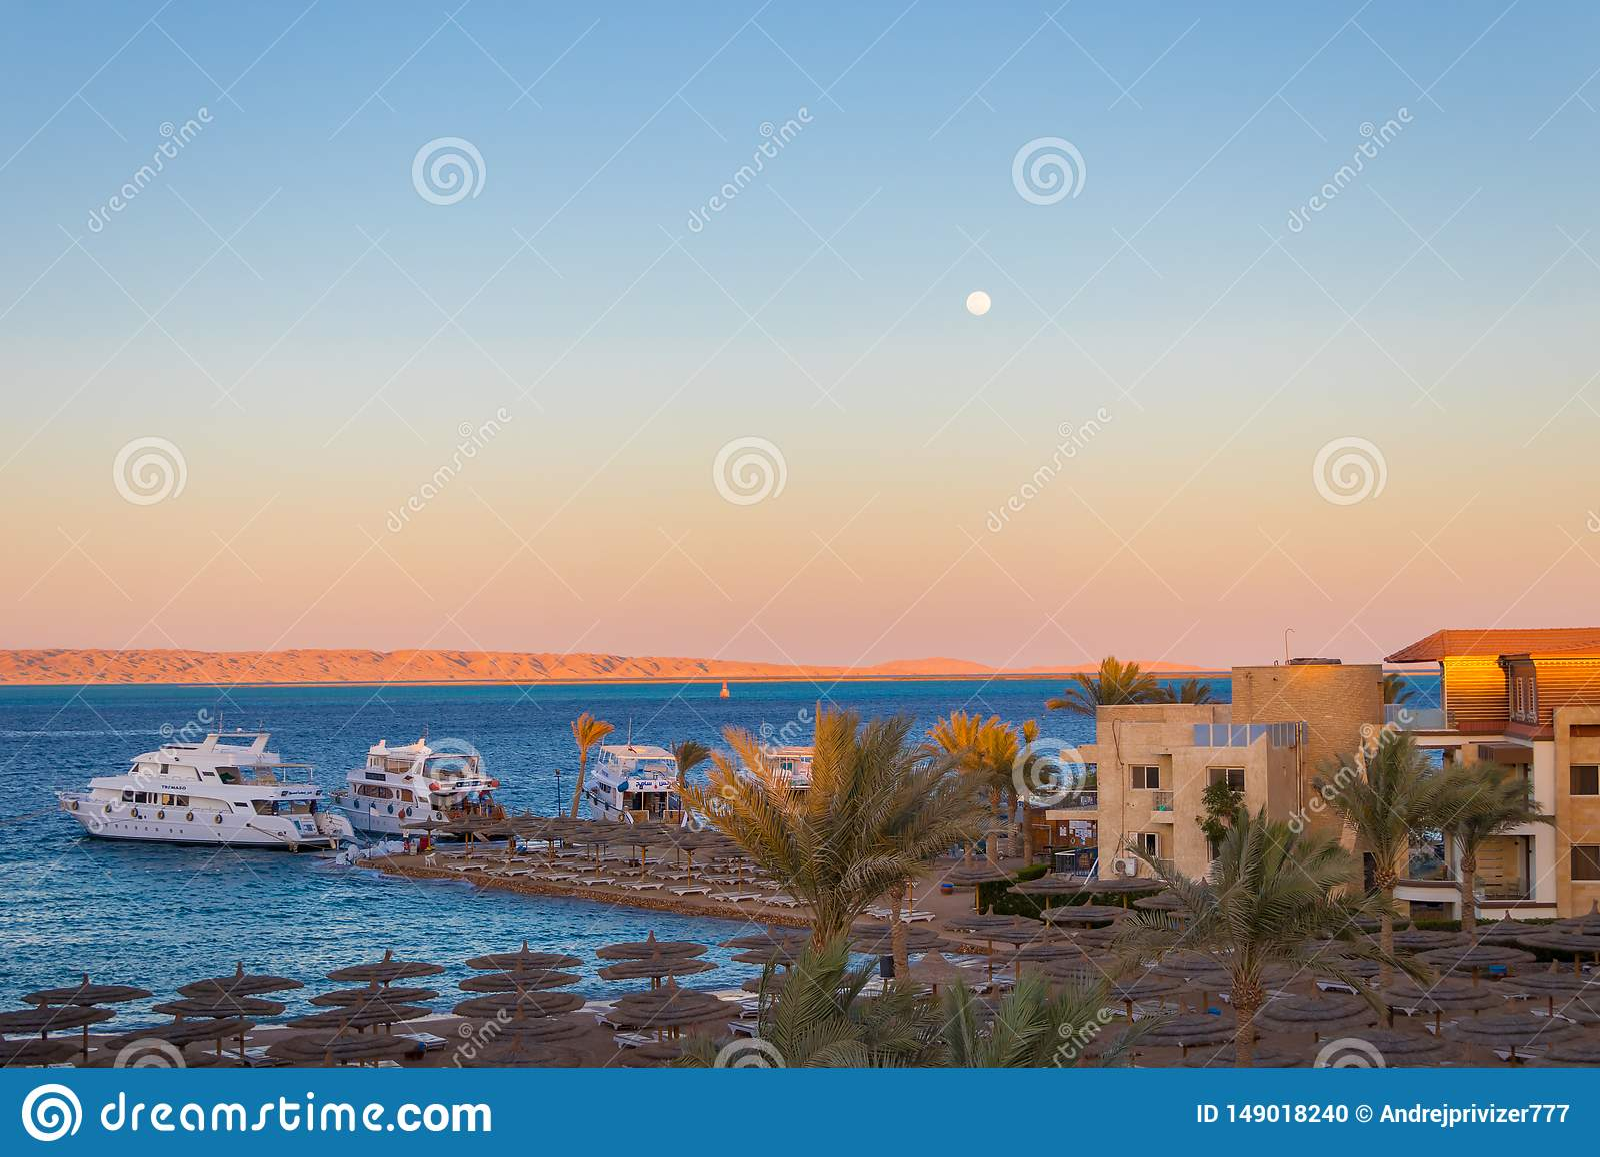 Zonsondergang over het rode overzees in Hurghada, Egypte